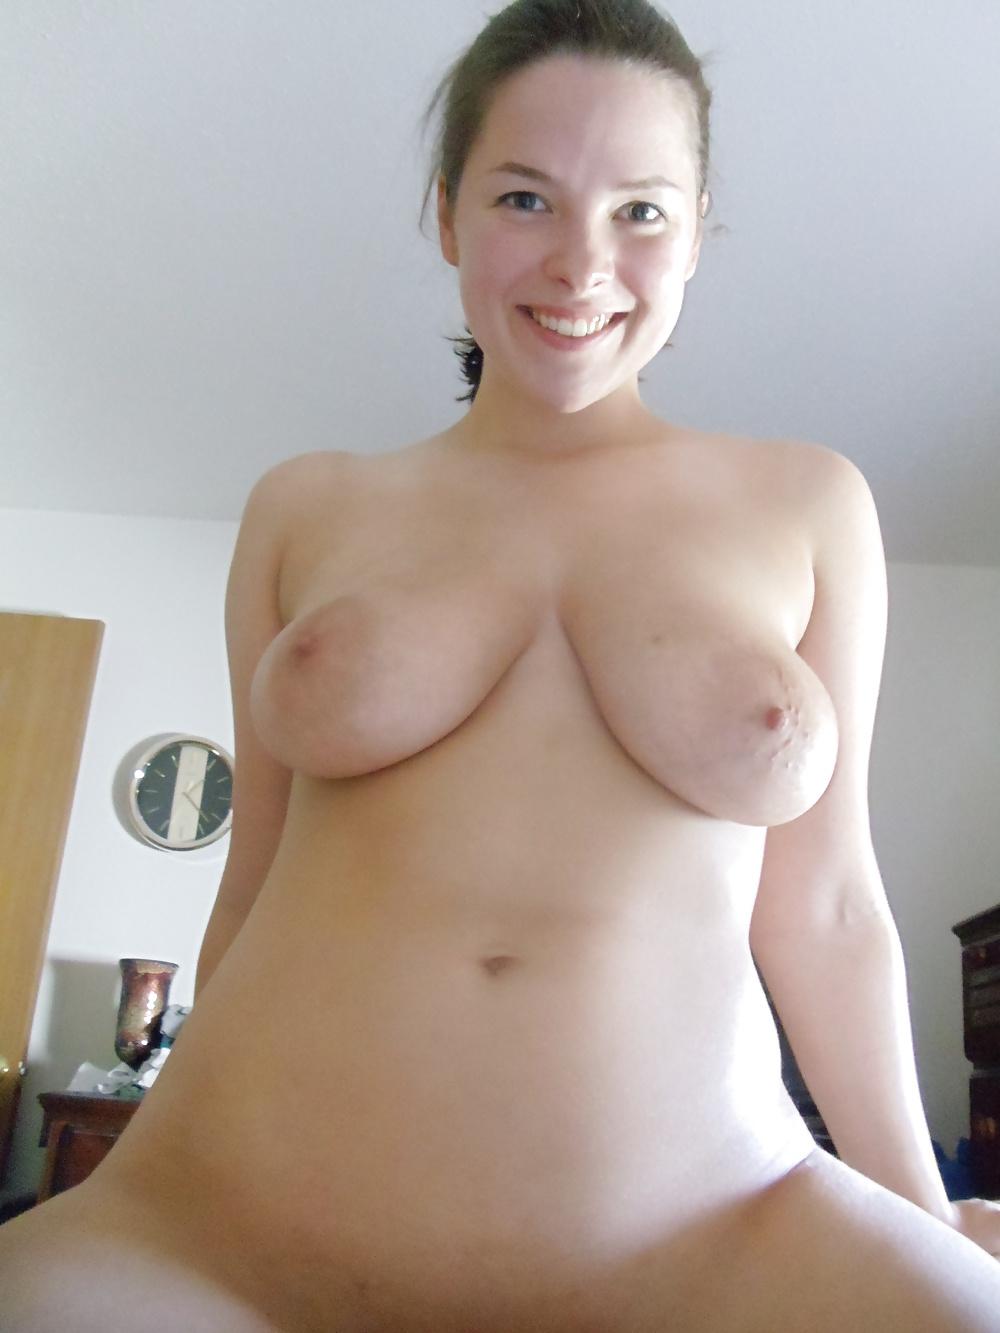 Hermosa gordibuena de cali masturbandose por webcam - 1 7